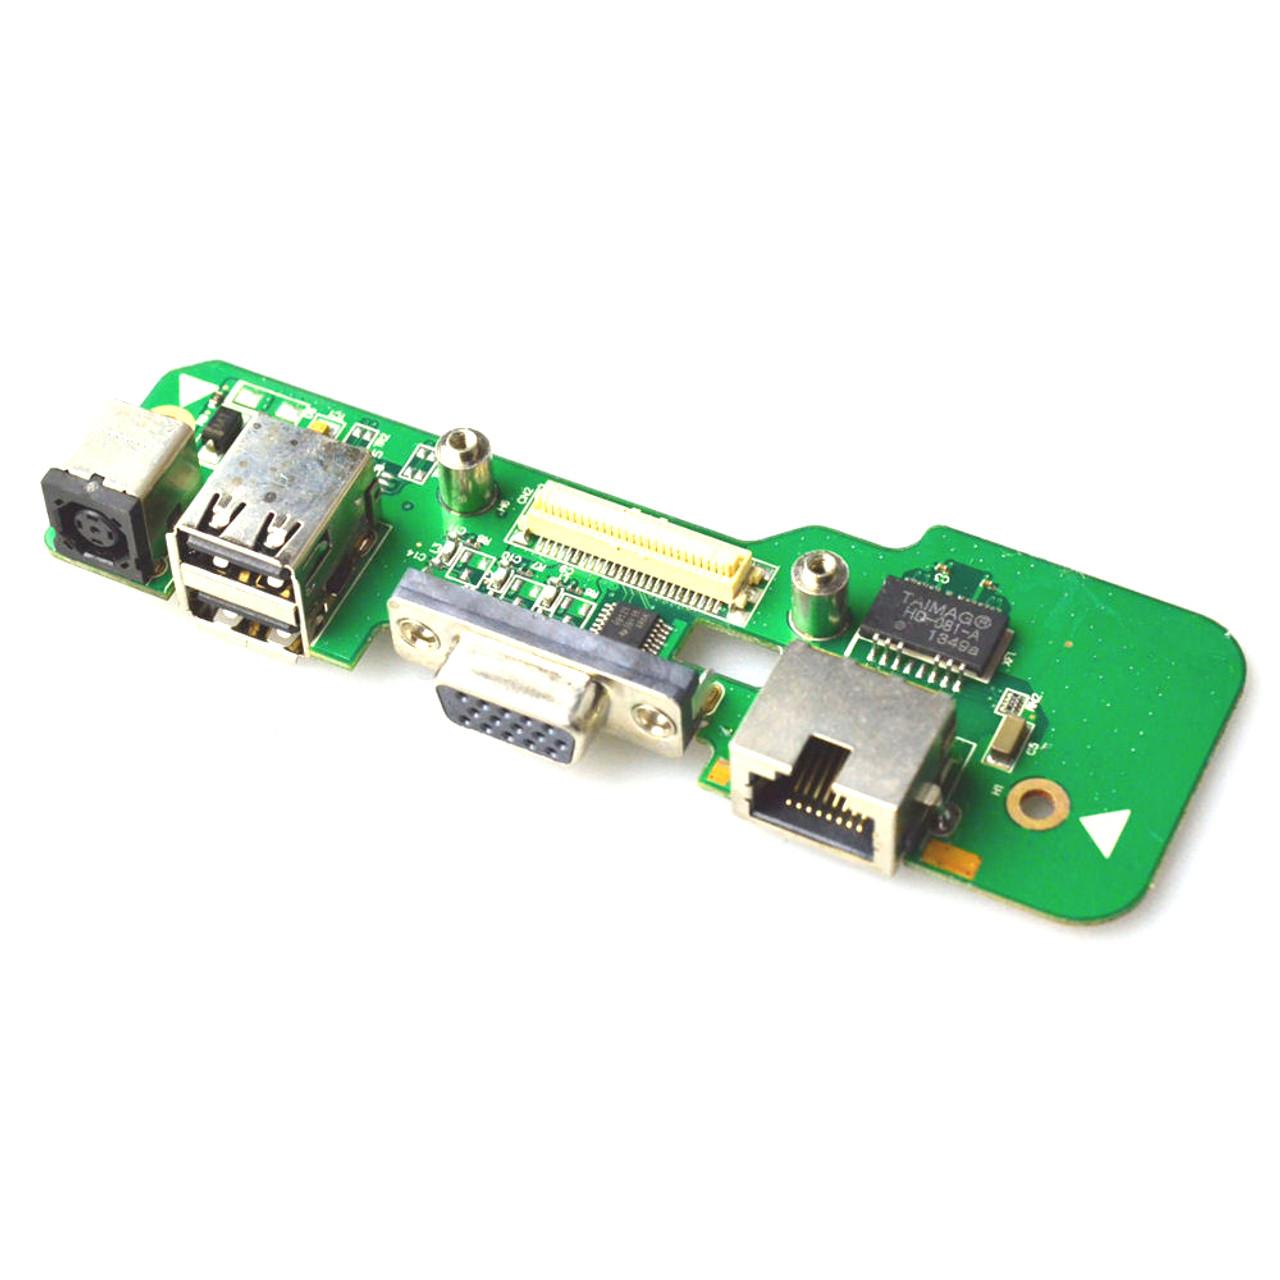 Dell Inspiron 1545 DC USB Charger Jack IO Board - 48.4AQ03.C11